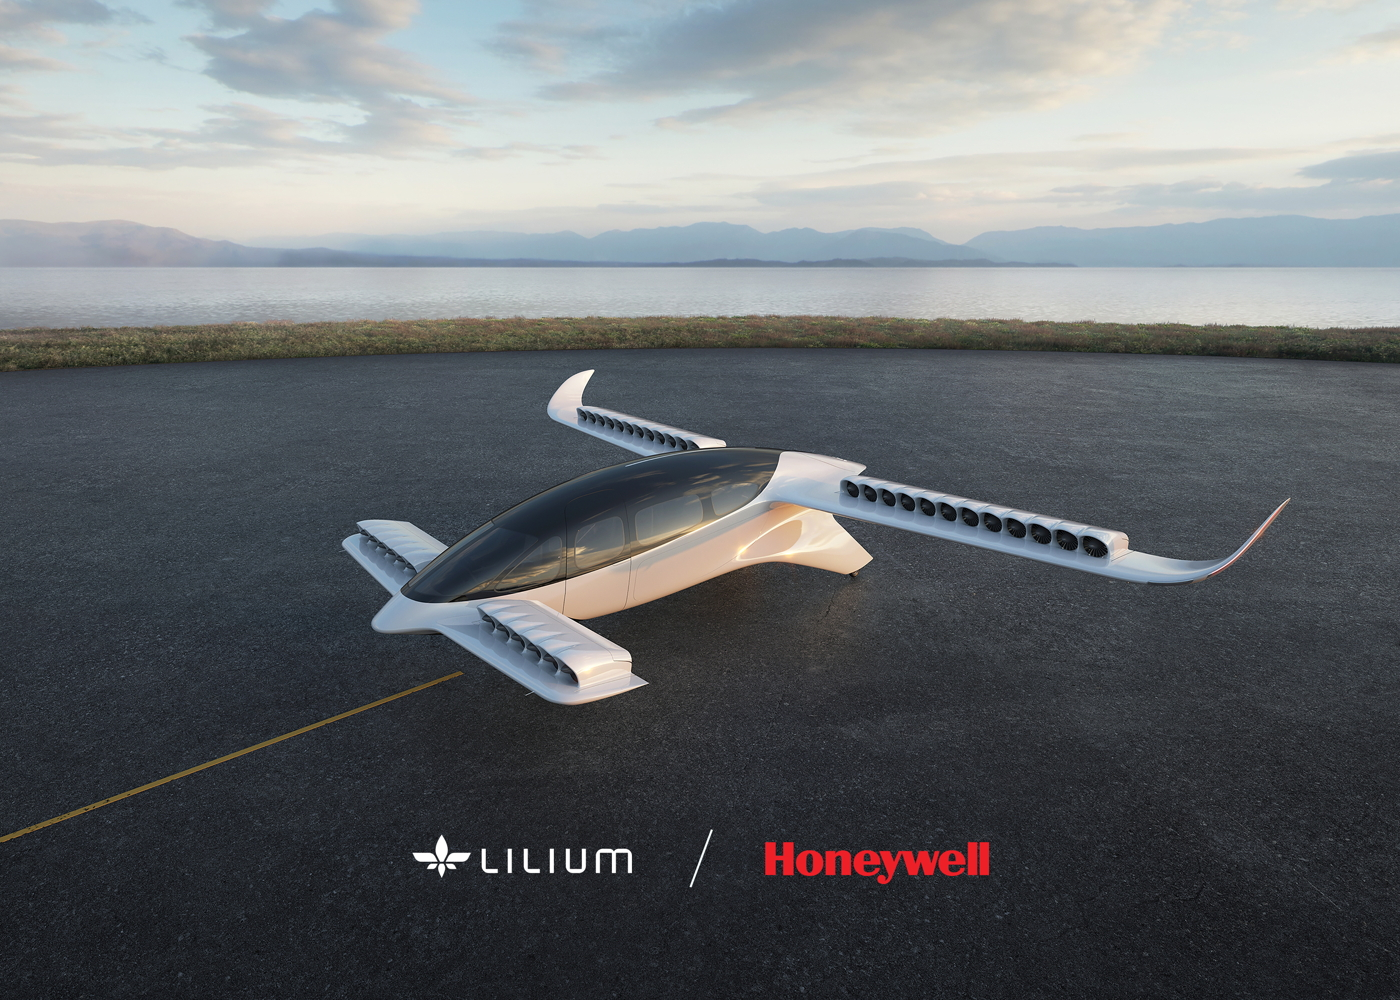 Lilium Jet Honeywell